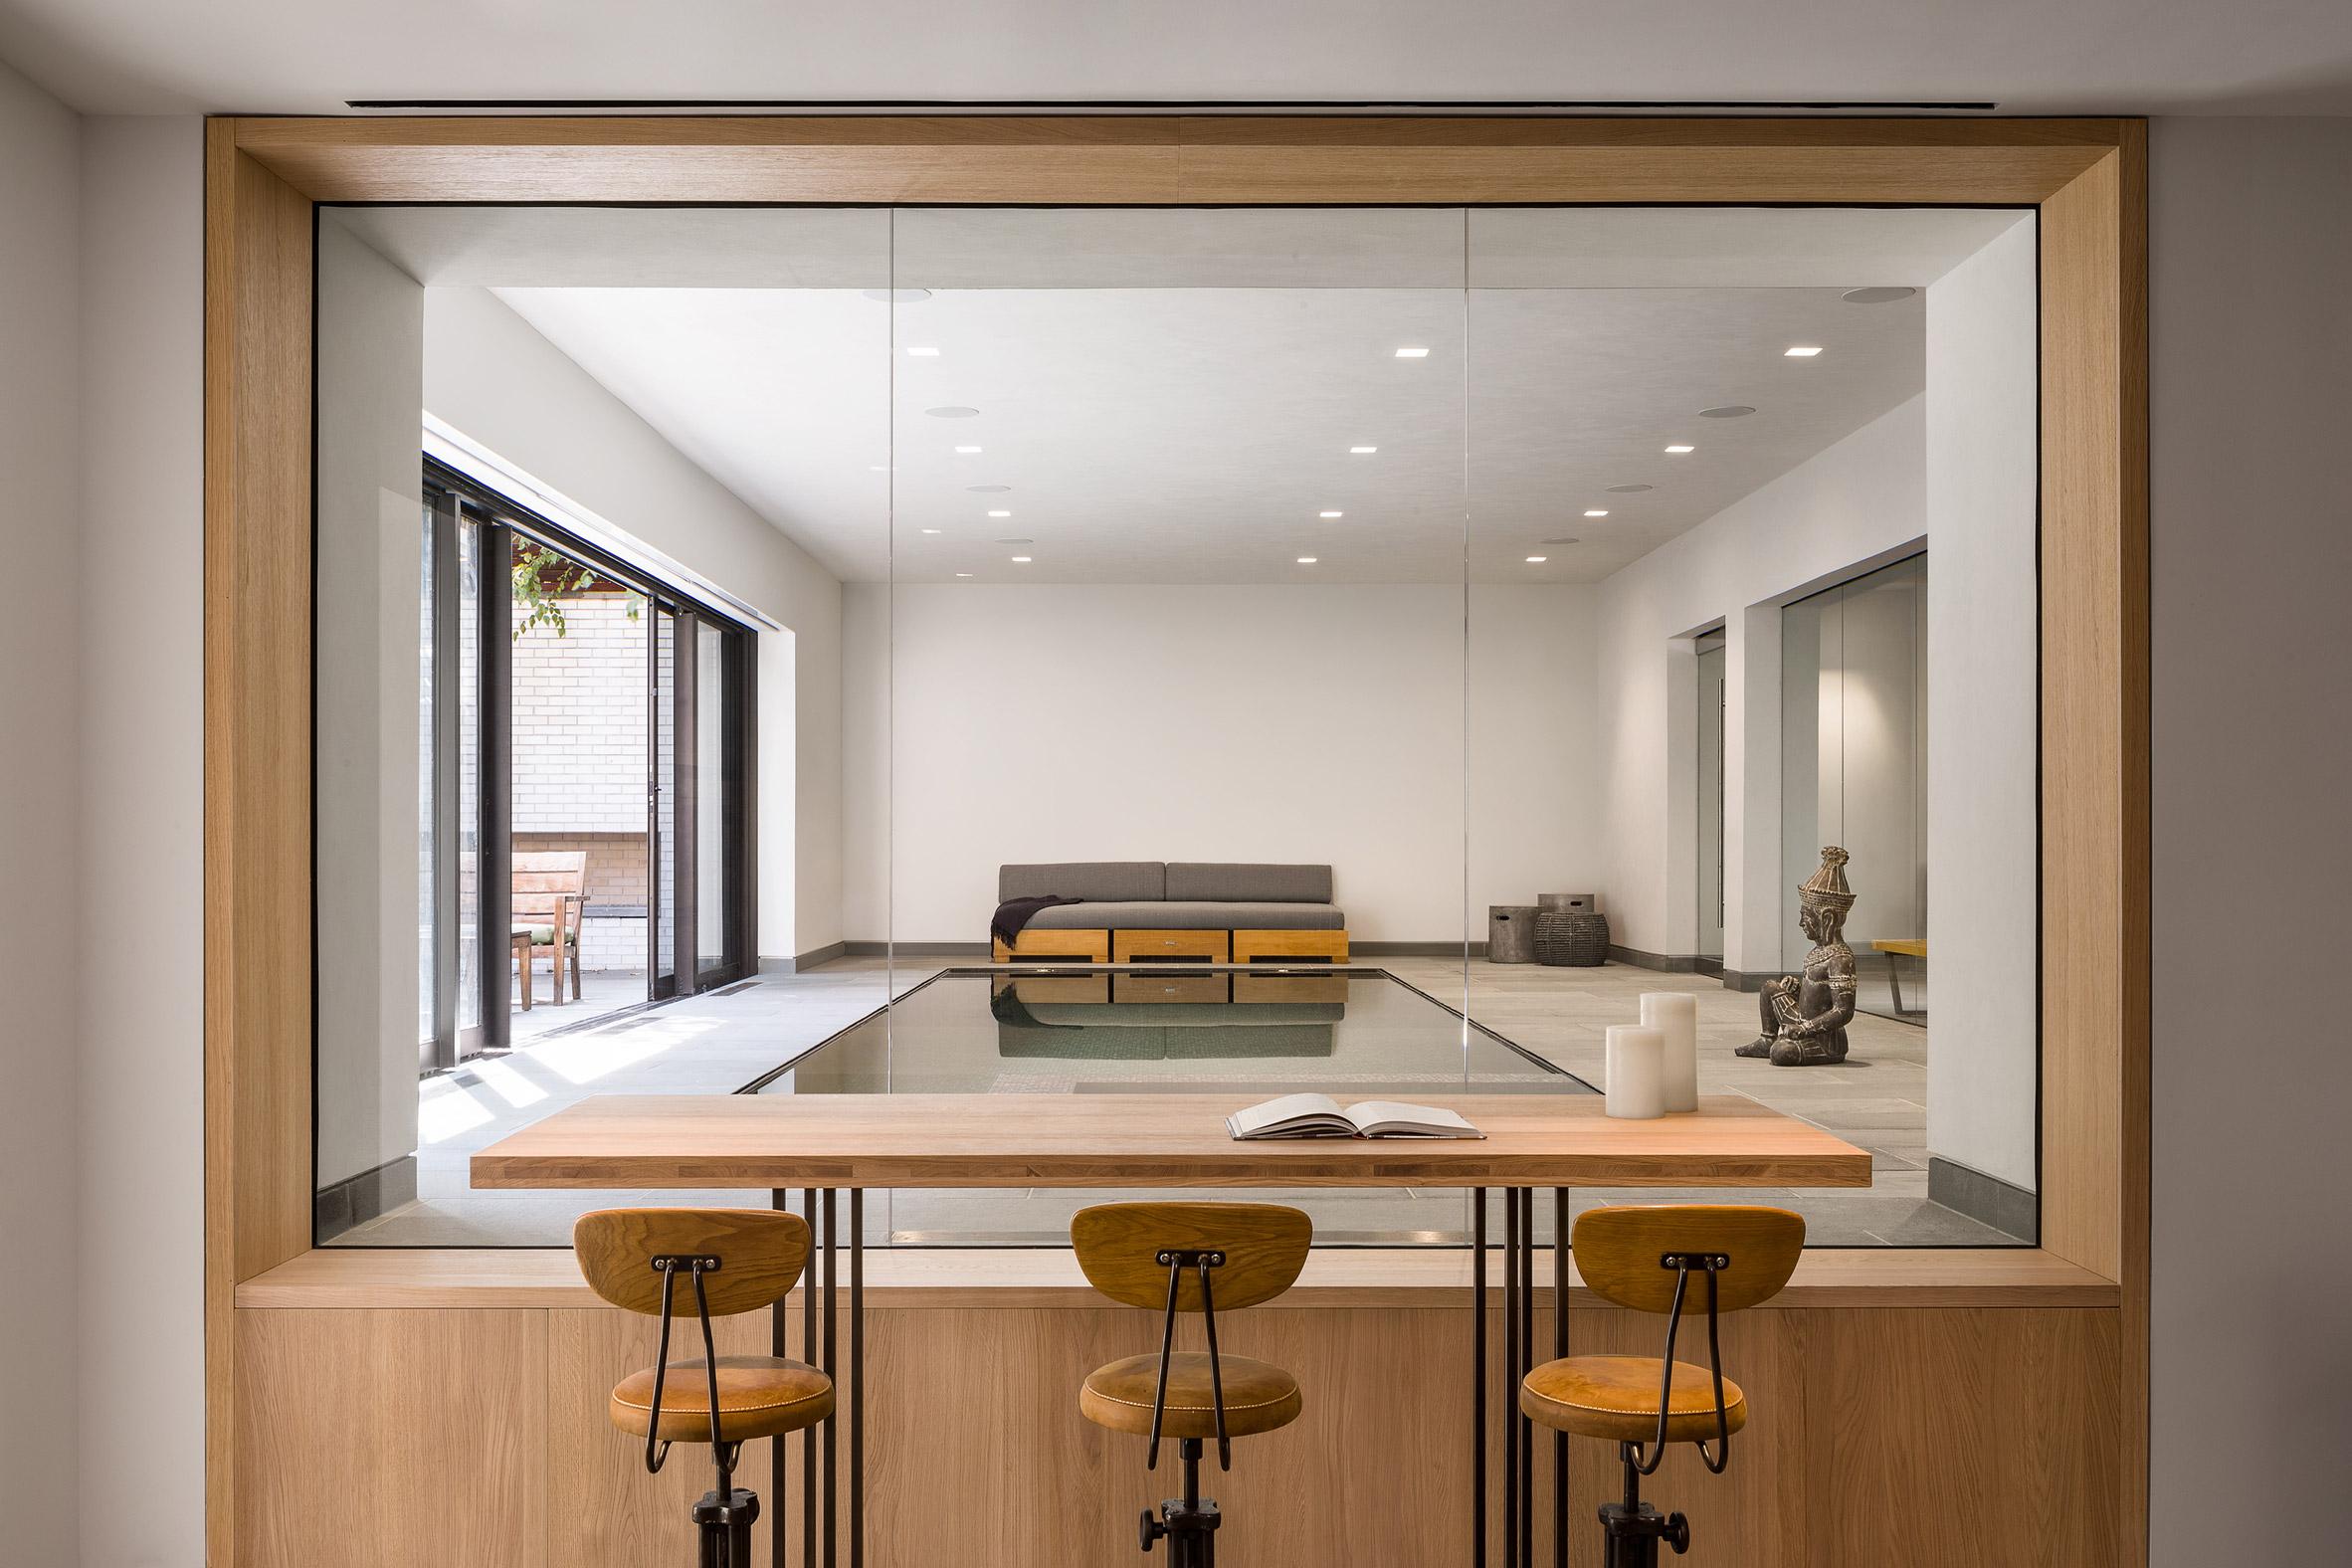 paulus-hook-residence-fogarty-finger-interiors-new-jersey-usa_dezeen_2364_col_11.jpg